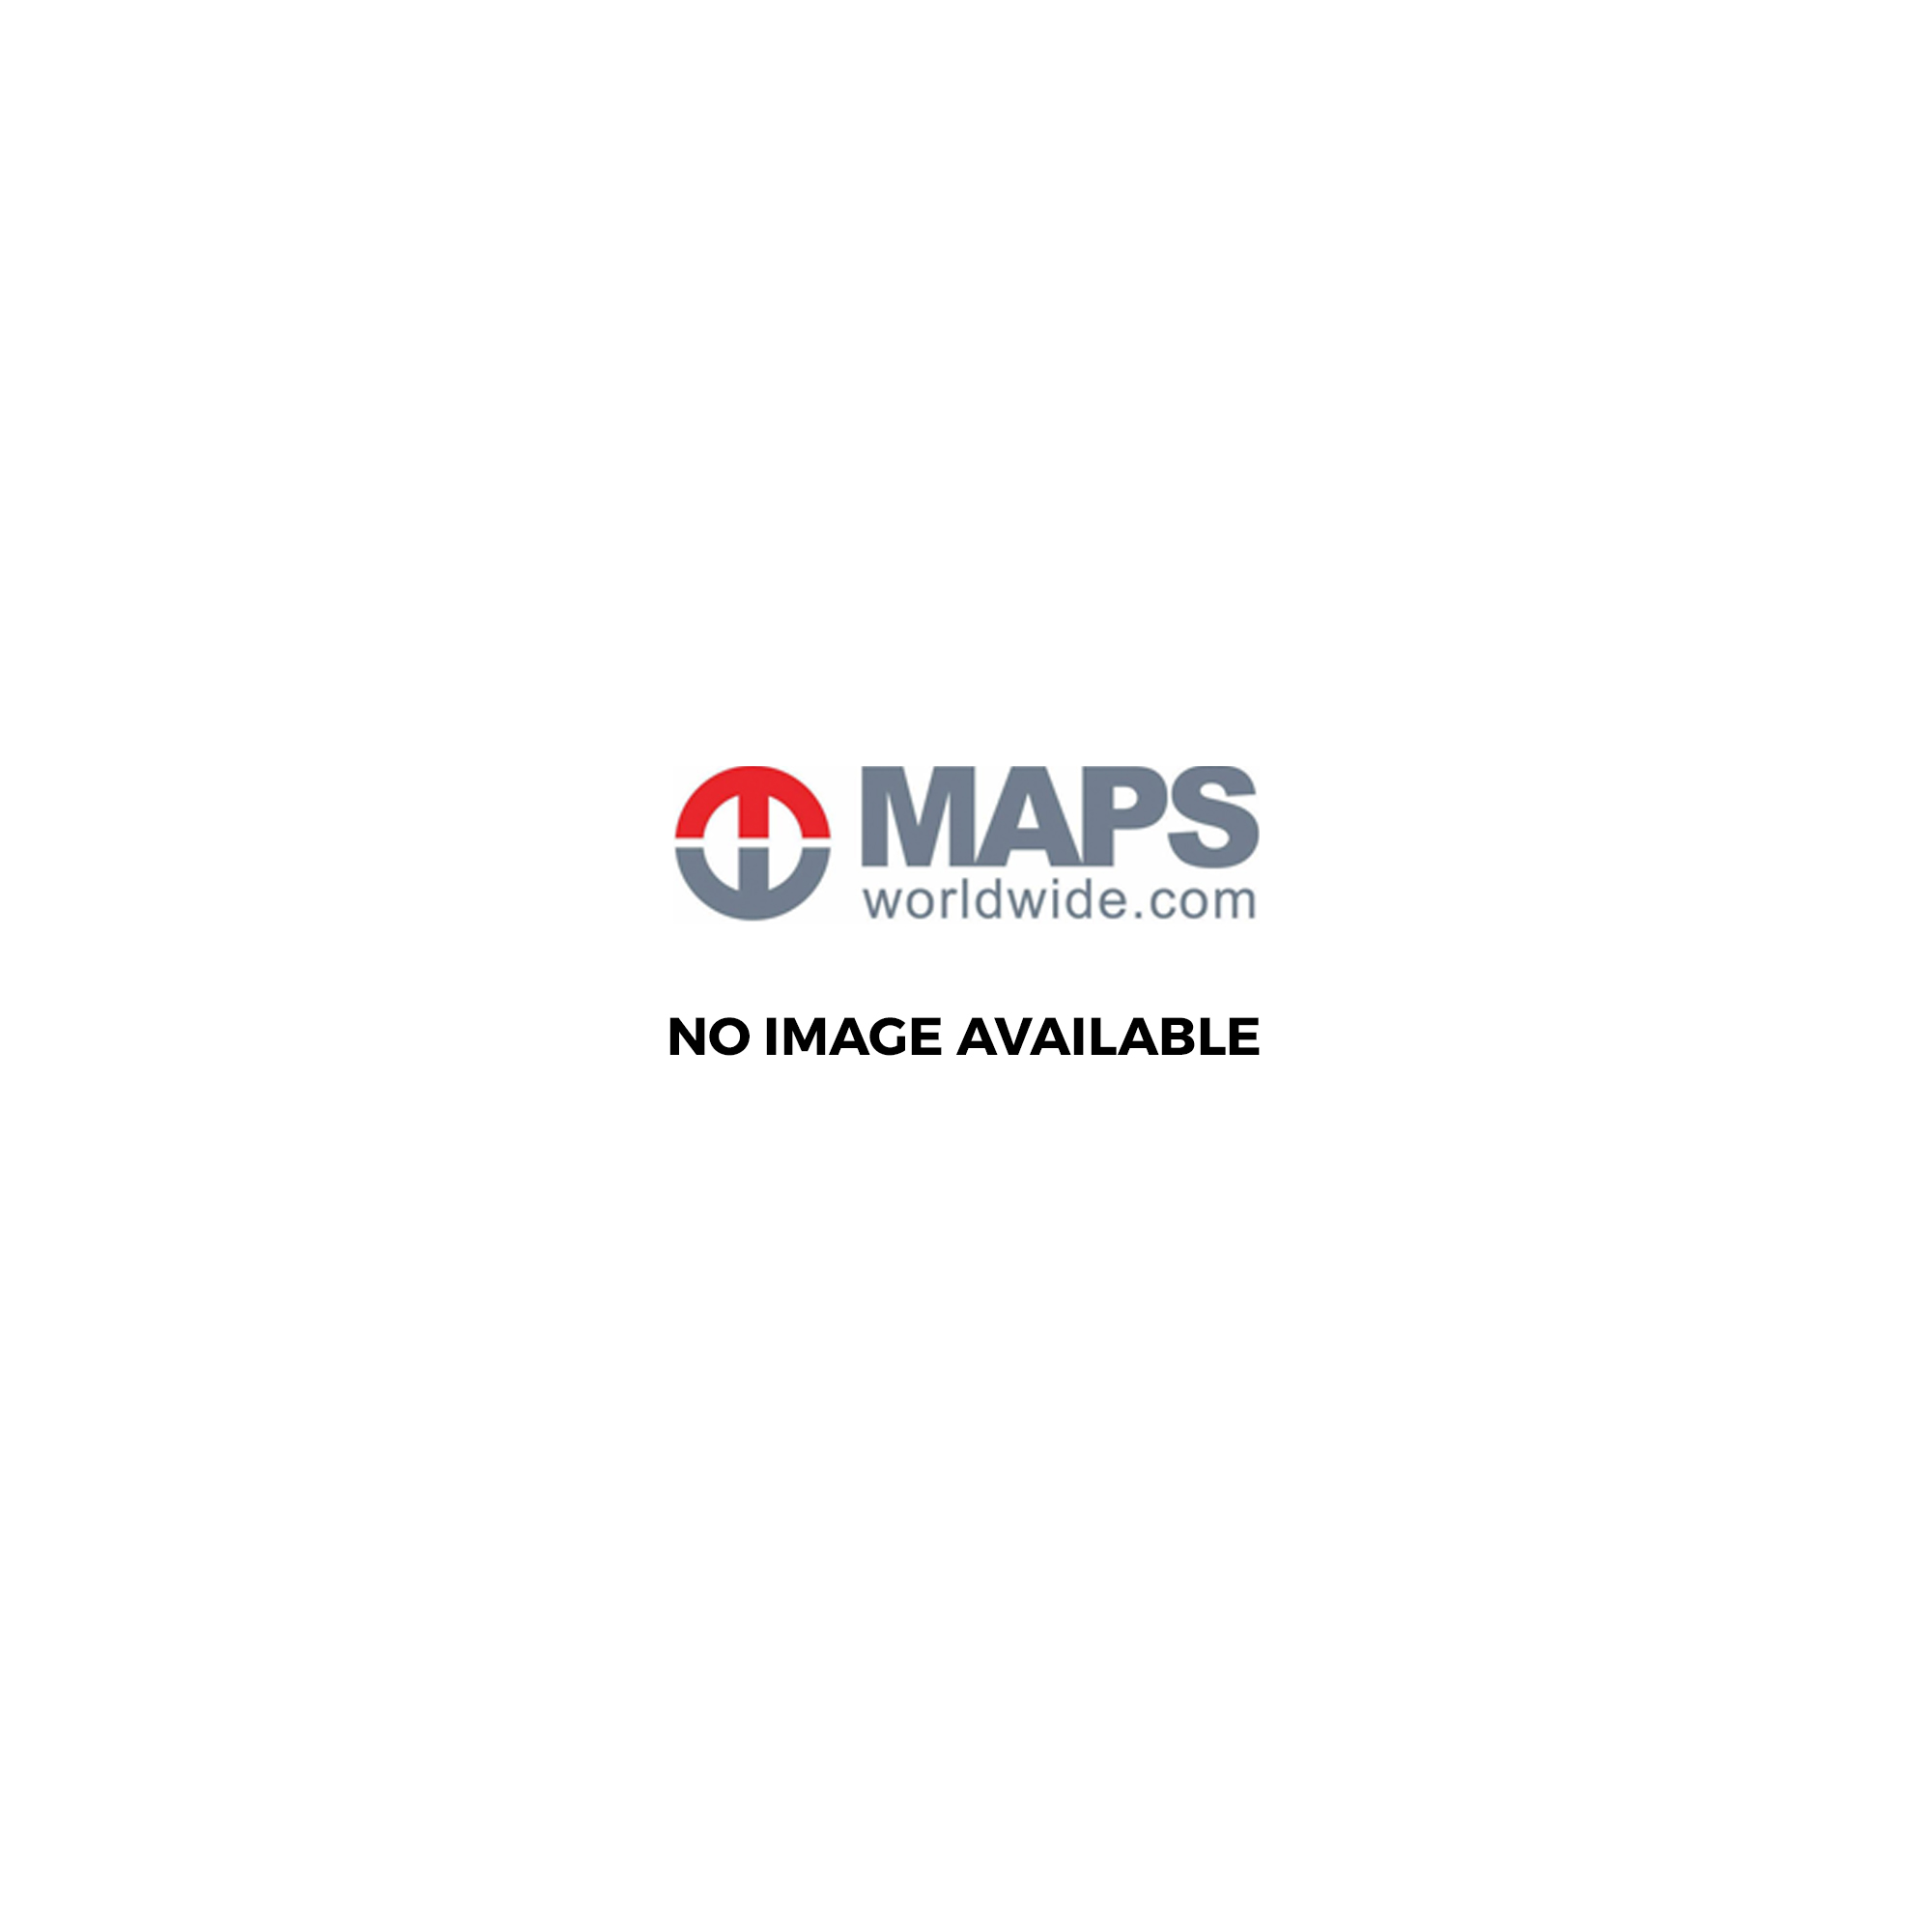 Az London Street Map.London A Z Postcode And Administrative Boundaries Wall Map Laminated Edition